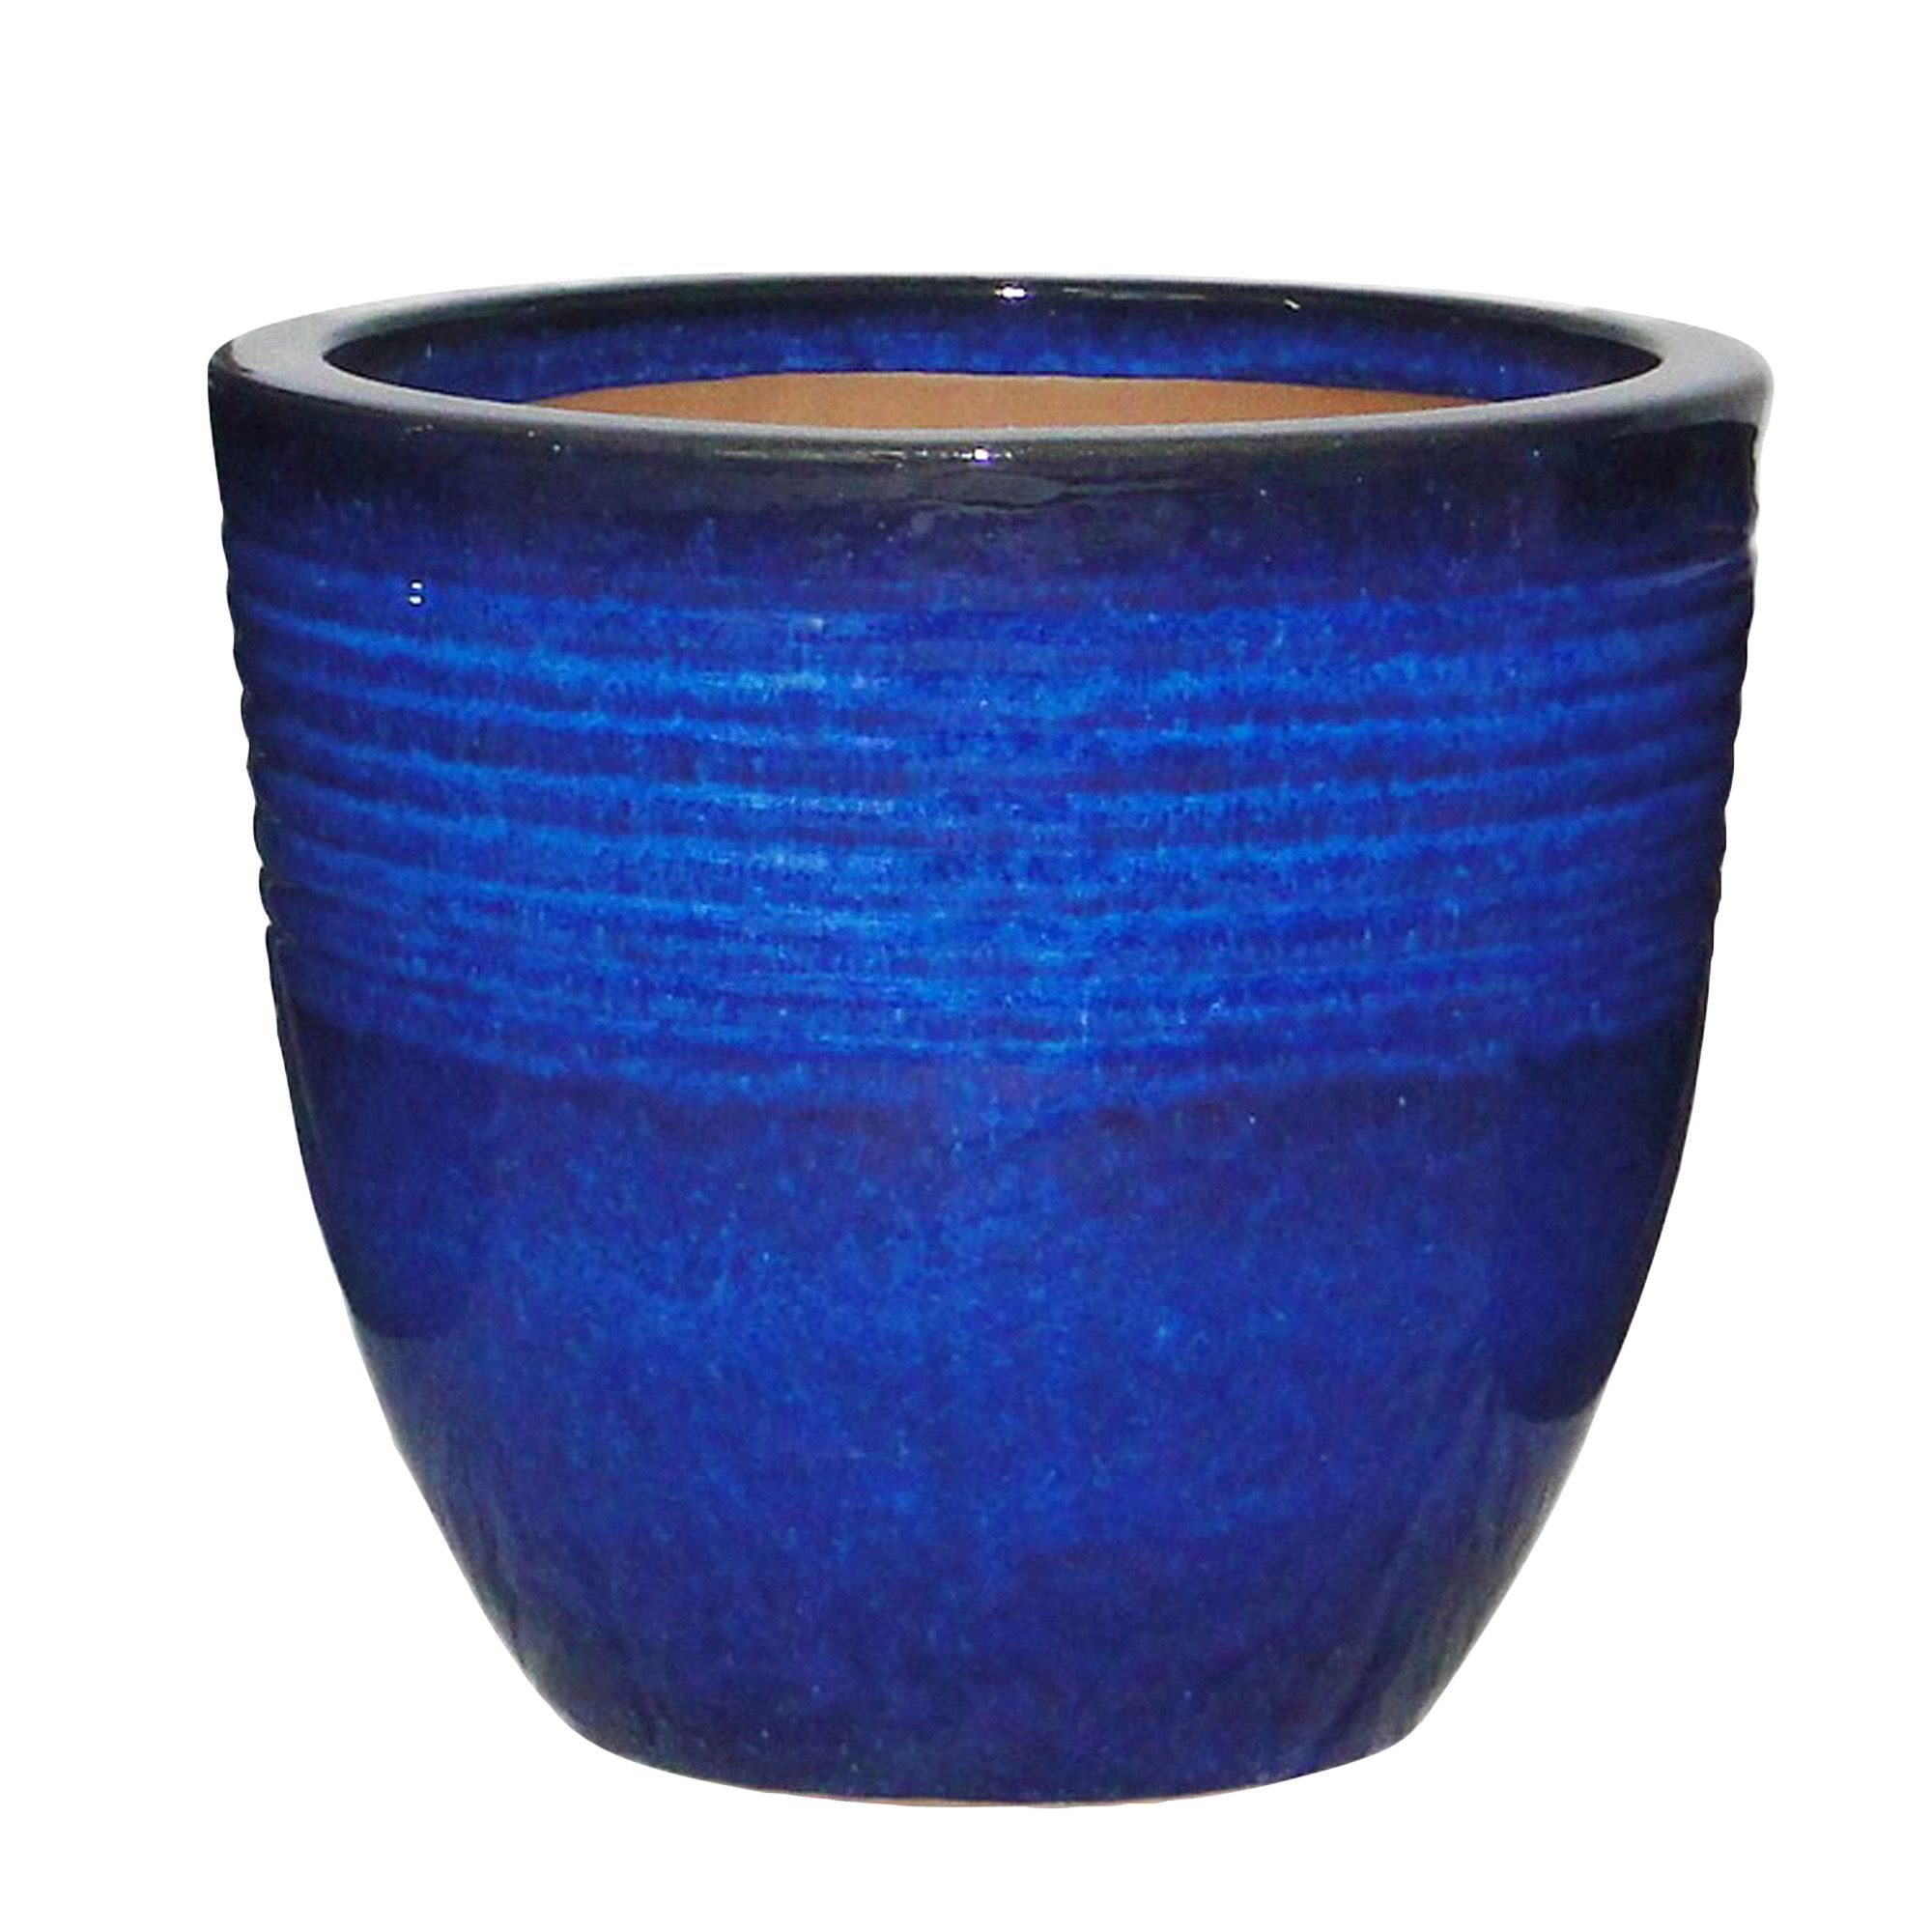 Seacourt Round Glazed Blue Pot H 245mm Dia 270mm Departments Diy At B Amp Q